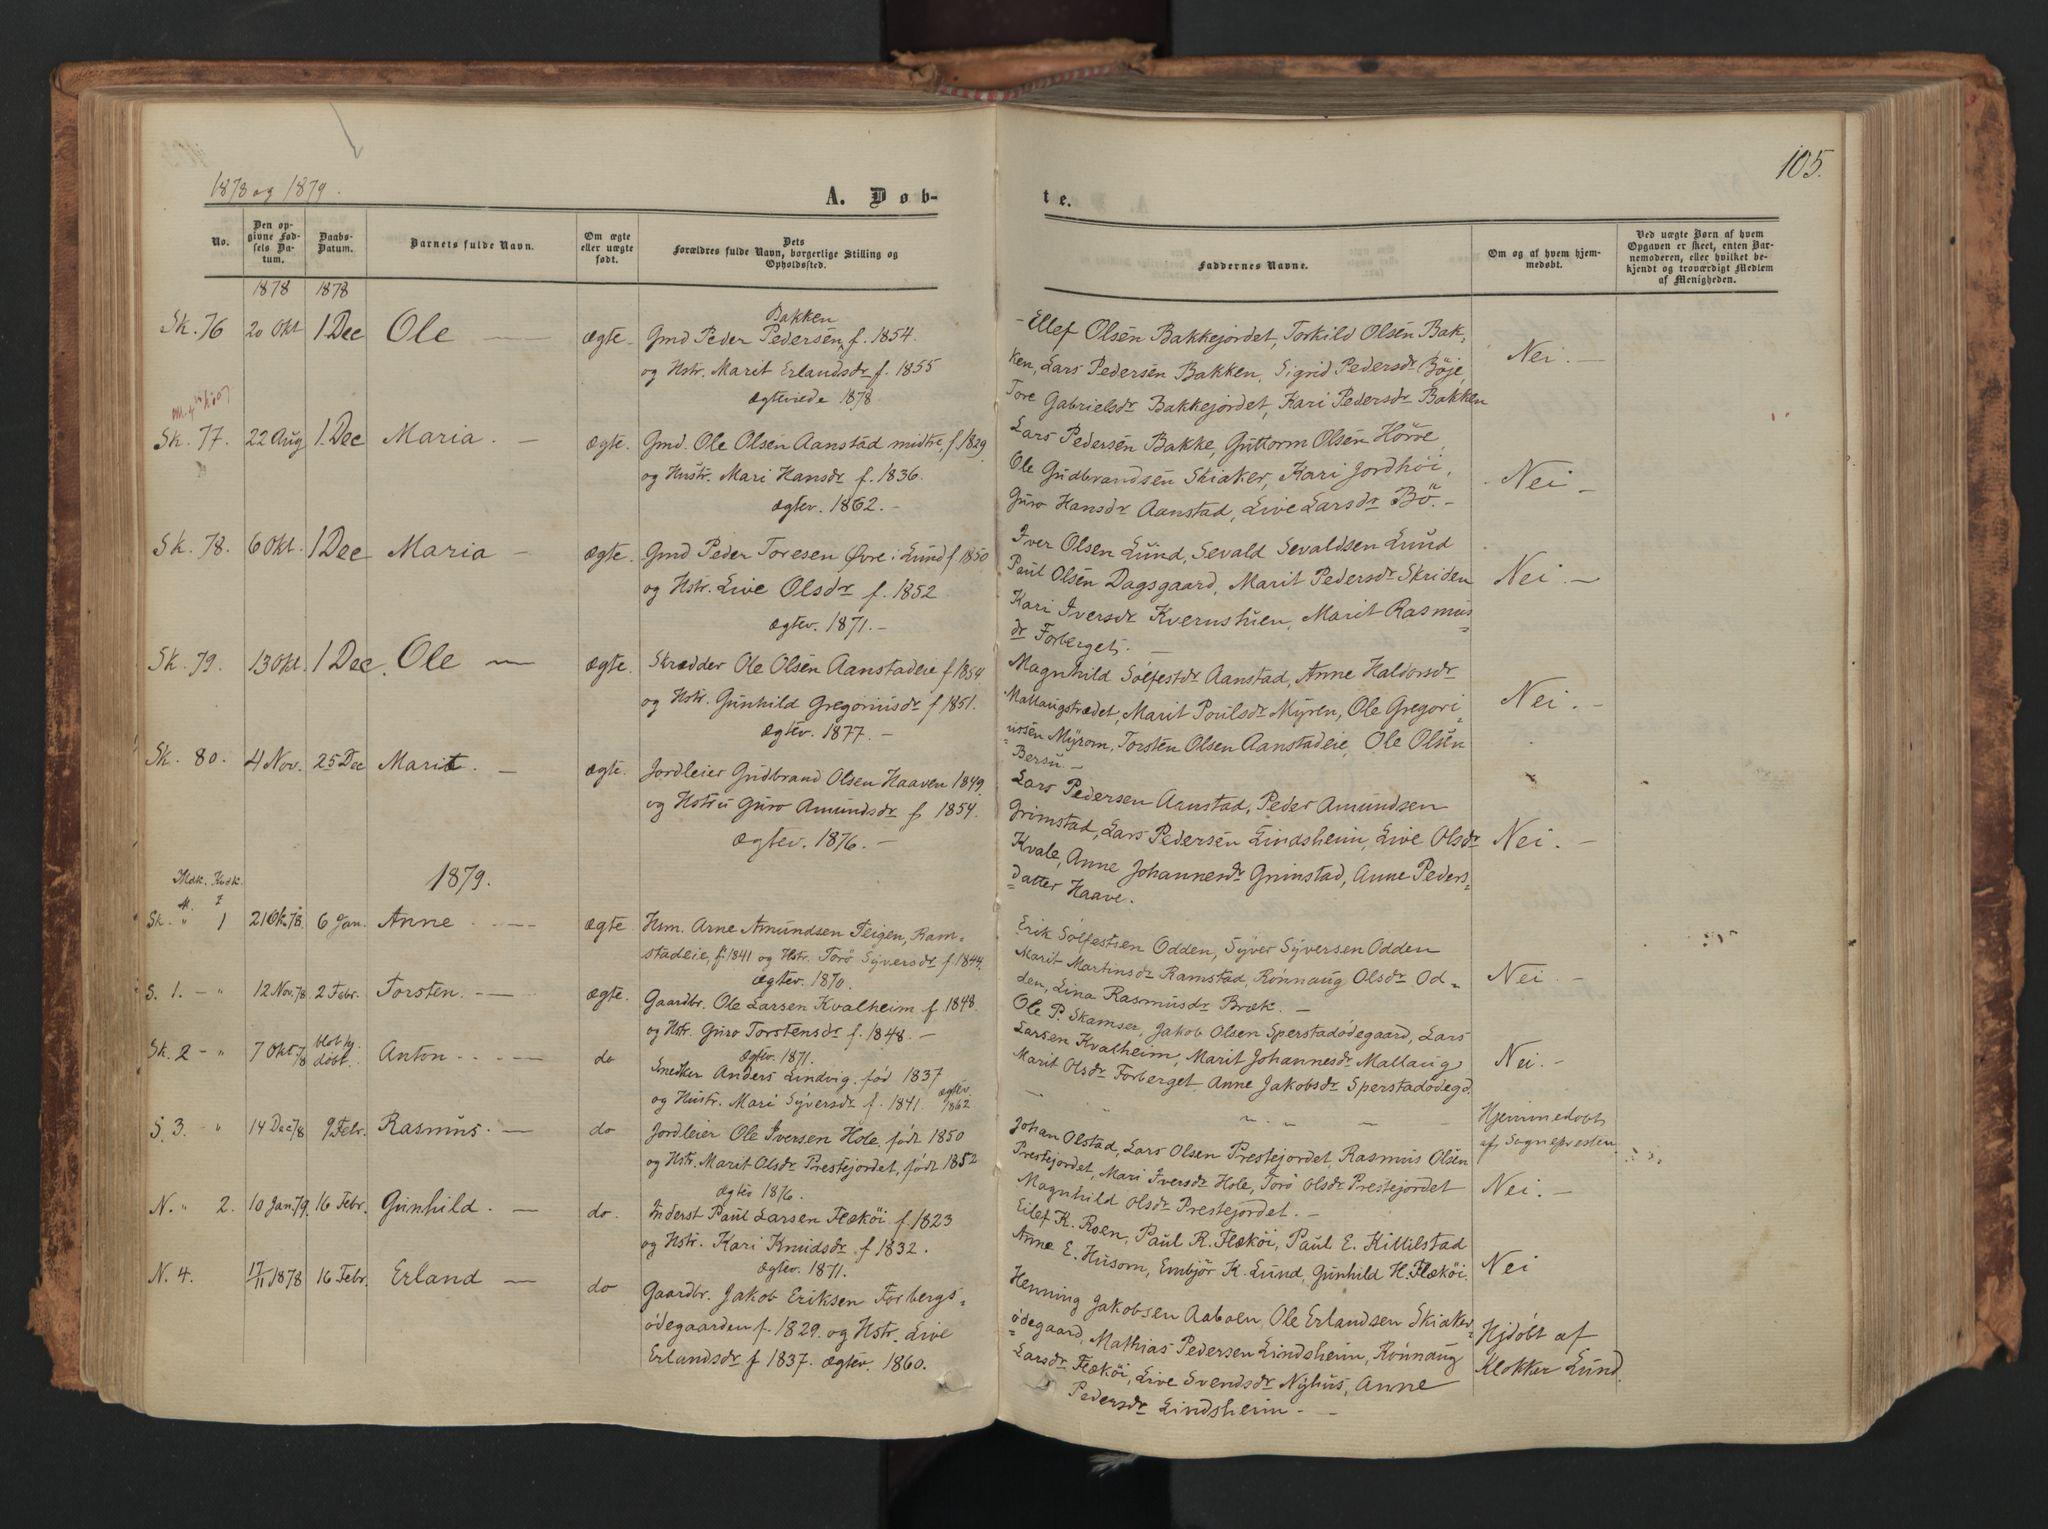 SAH, Skjåk prestekontor, Ministerialbok nr. 1, 1863-1879, s. 105